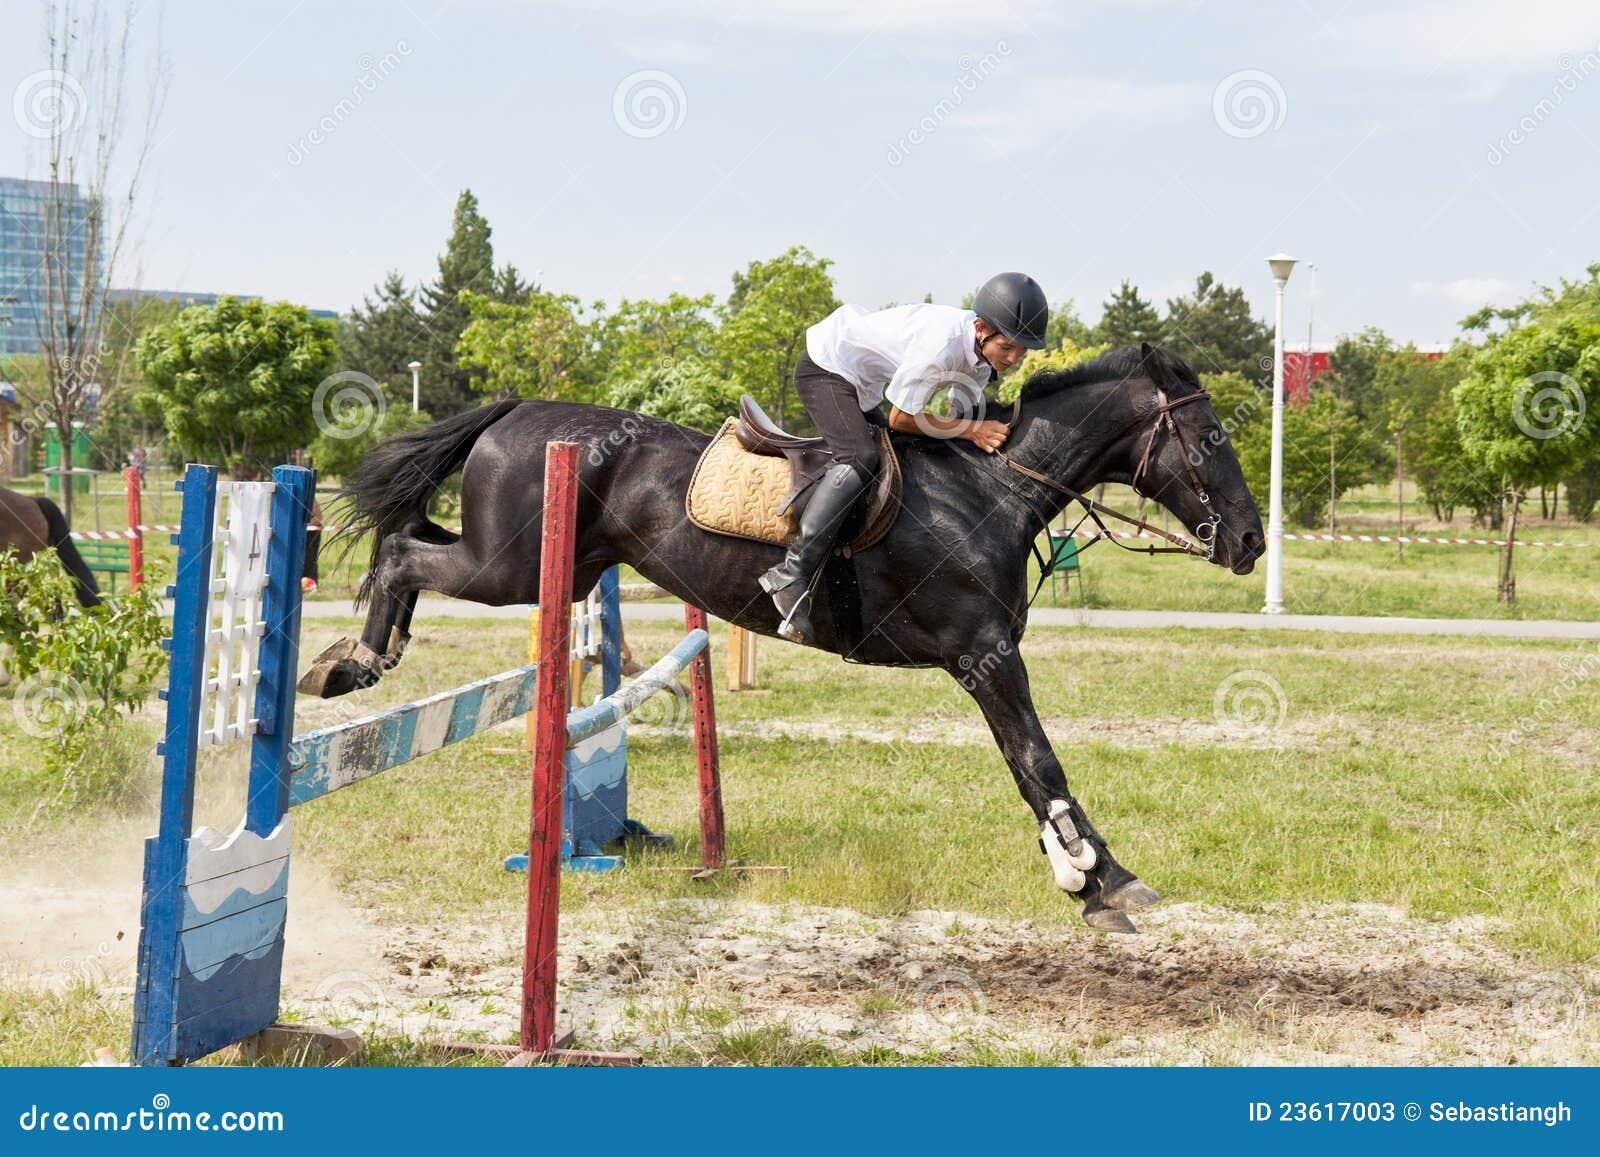 Black horses jumping - photo#28